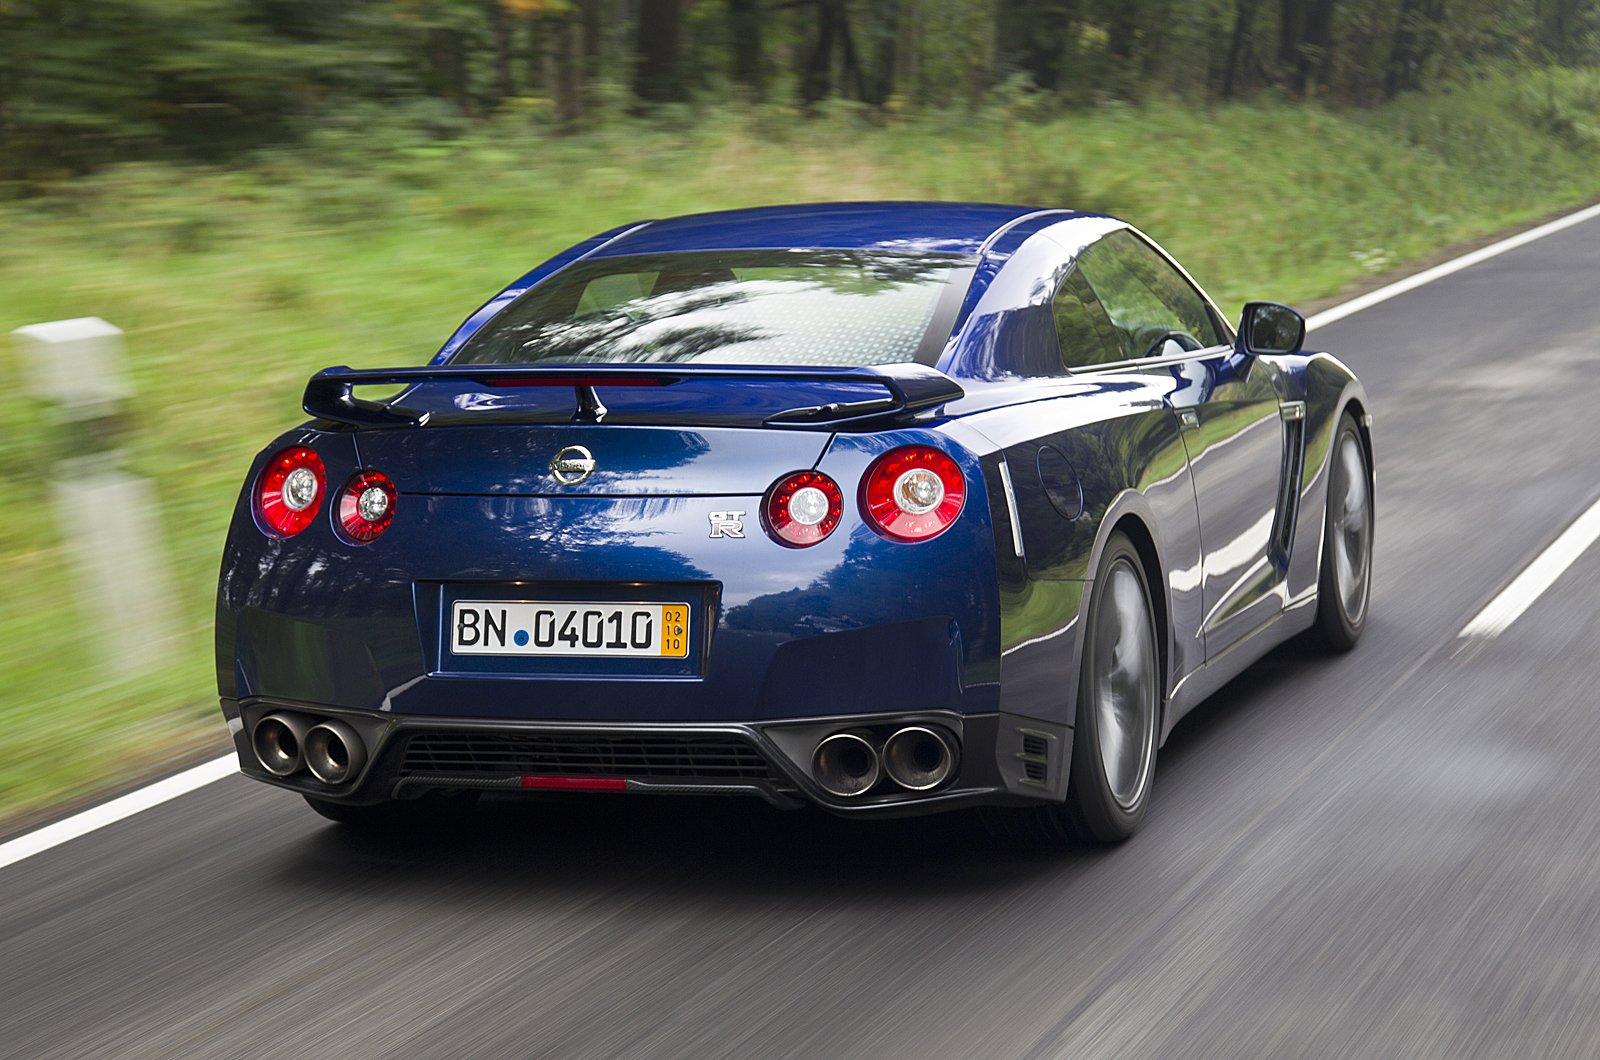 http://2.bp.blogspot.com/-7RPByi6hdk0/TsdbDfpLWSI/AAAAAAAAEvI/ZXFPfdEBw48/s1600/2012+Nissan+R35+GTR+Aurora+Flare+Blue+Pearl+color+rear+view.jpg